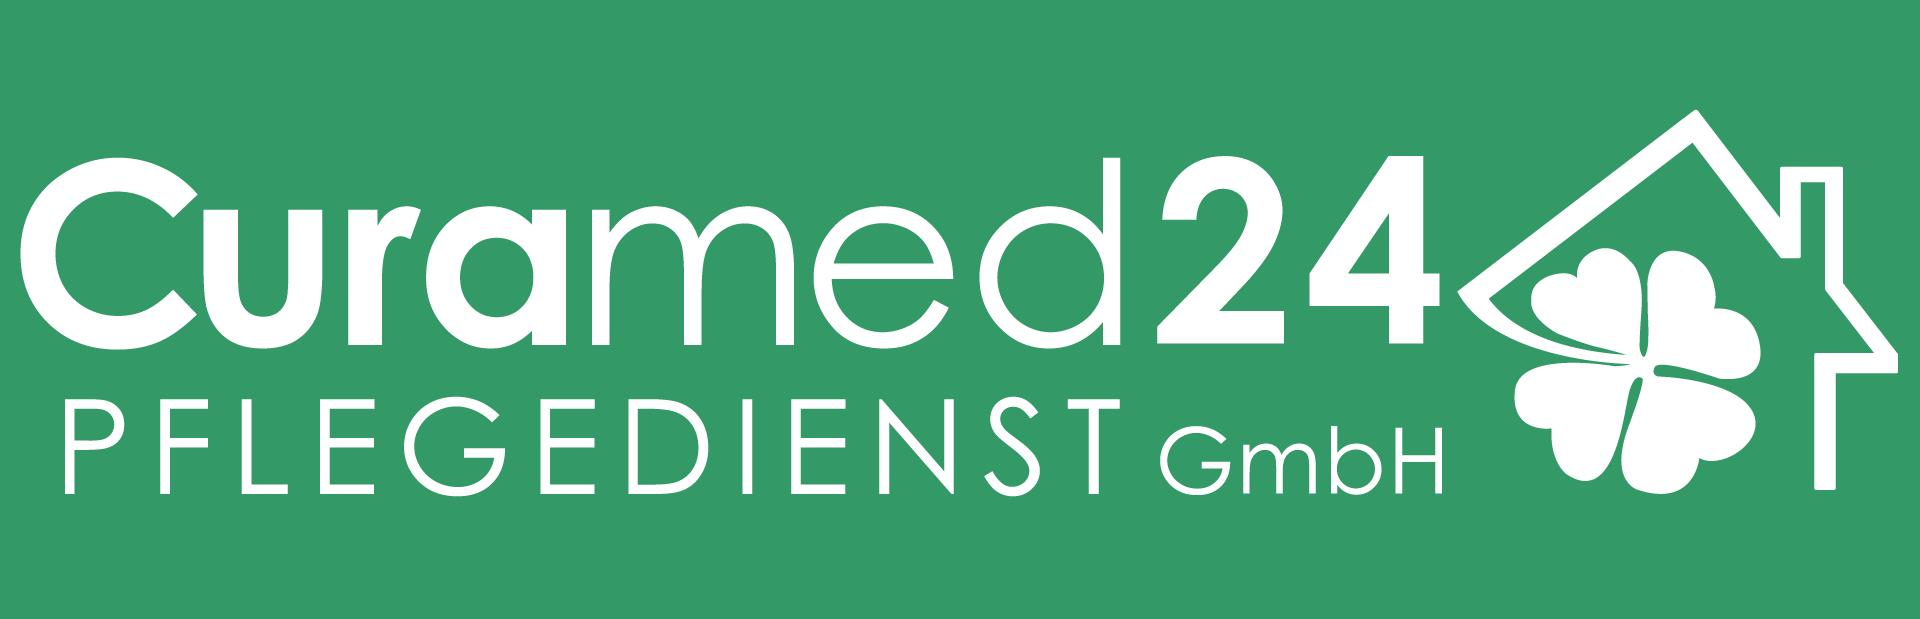 Curamed24 Pflegedienst GmbH